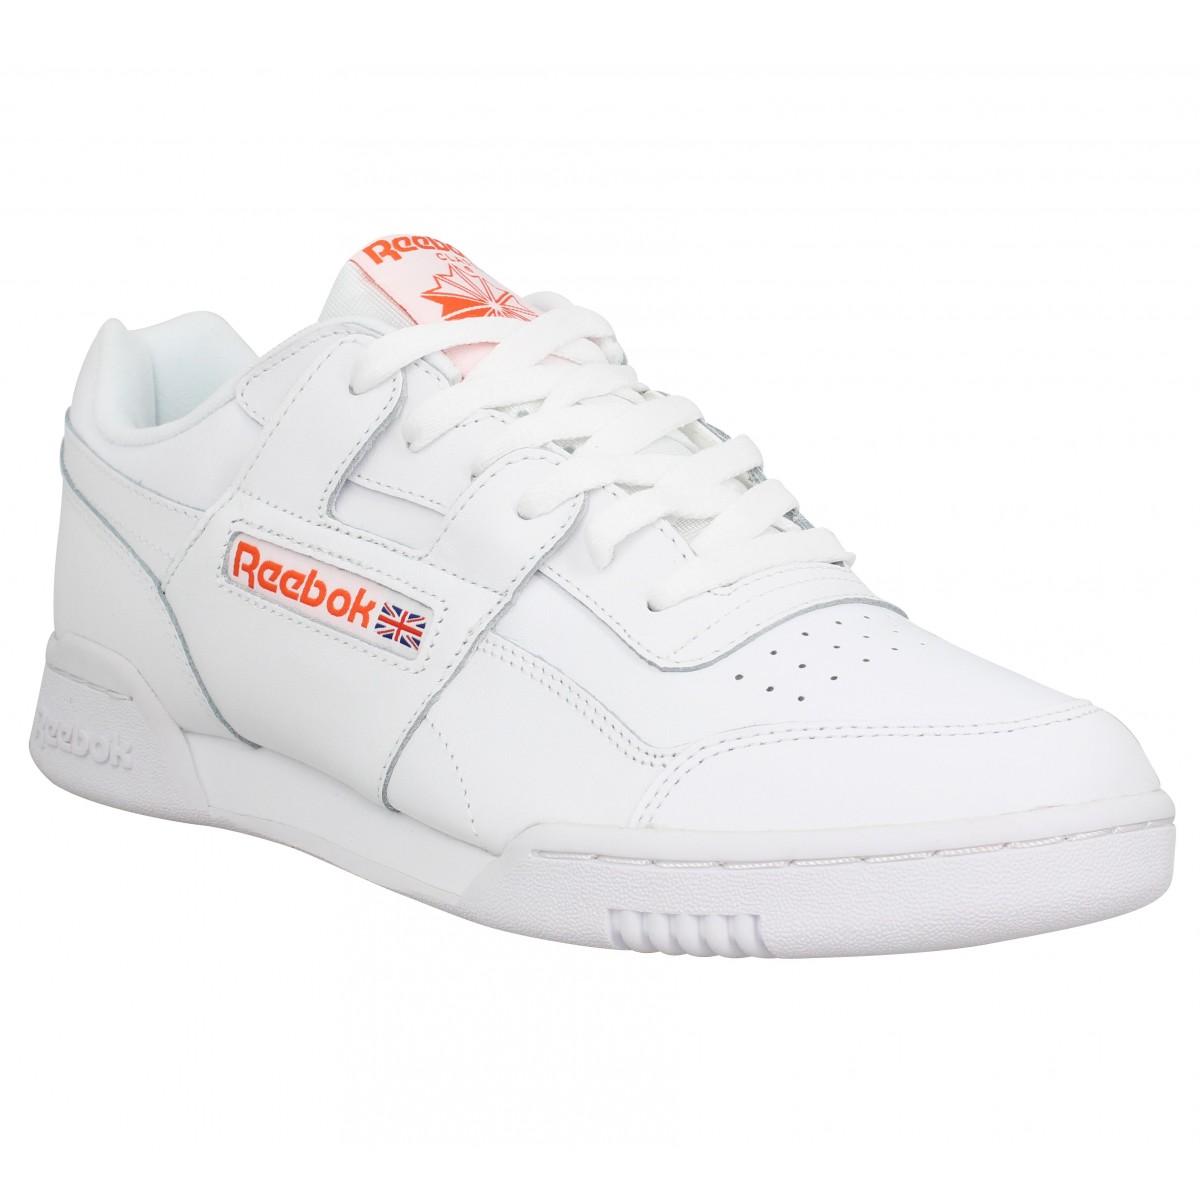 REEBOK Workout Plus cuir Homme Blanc Orange